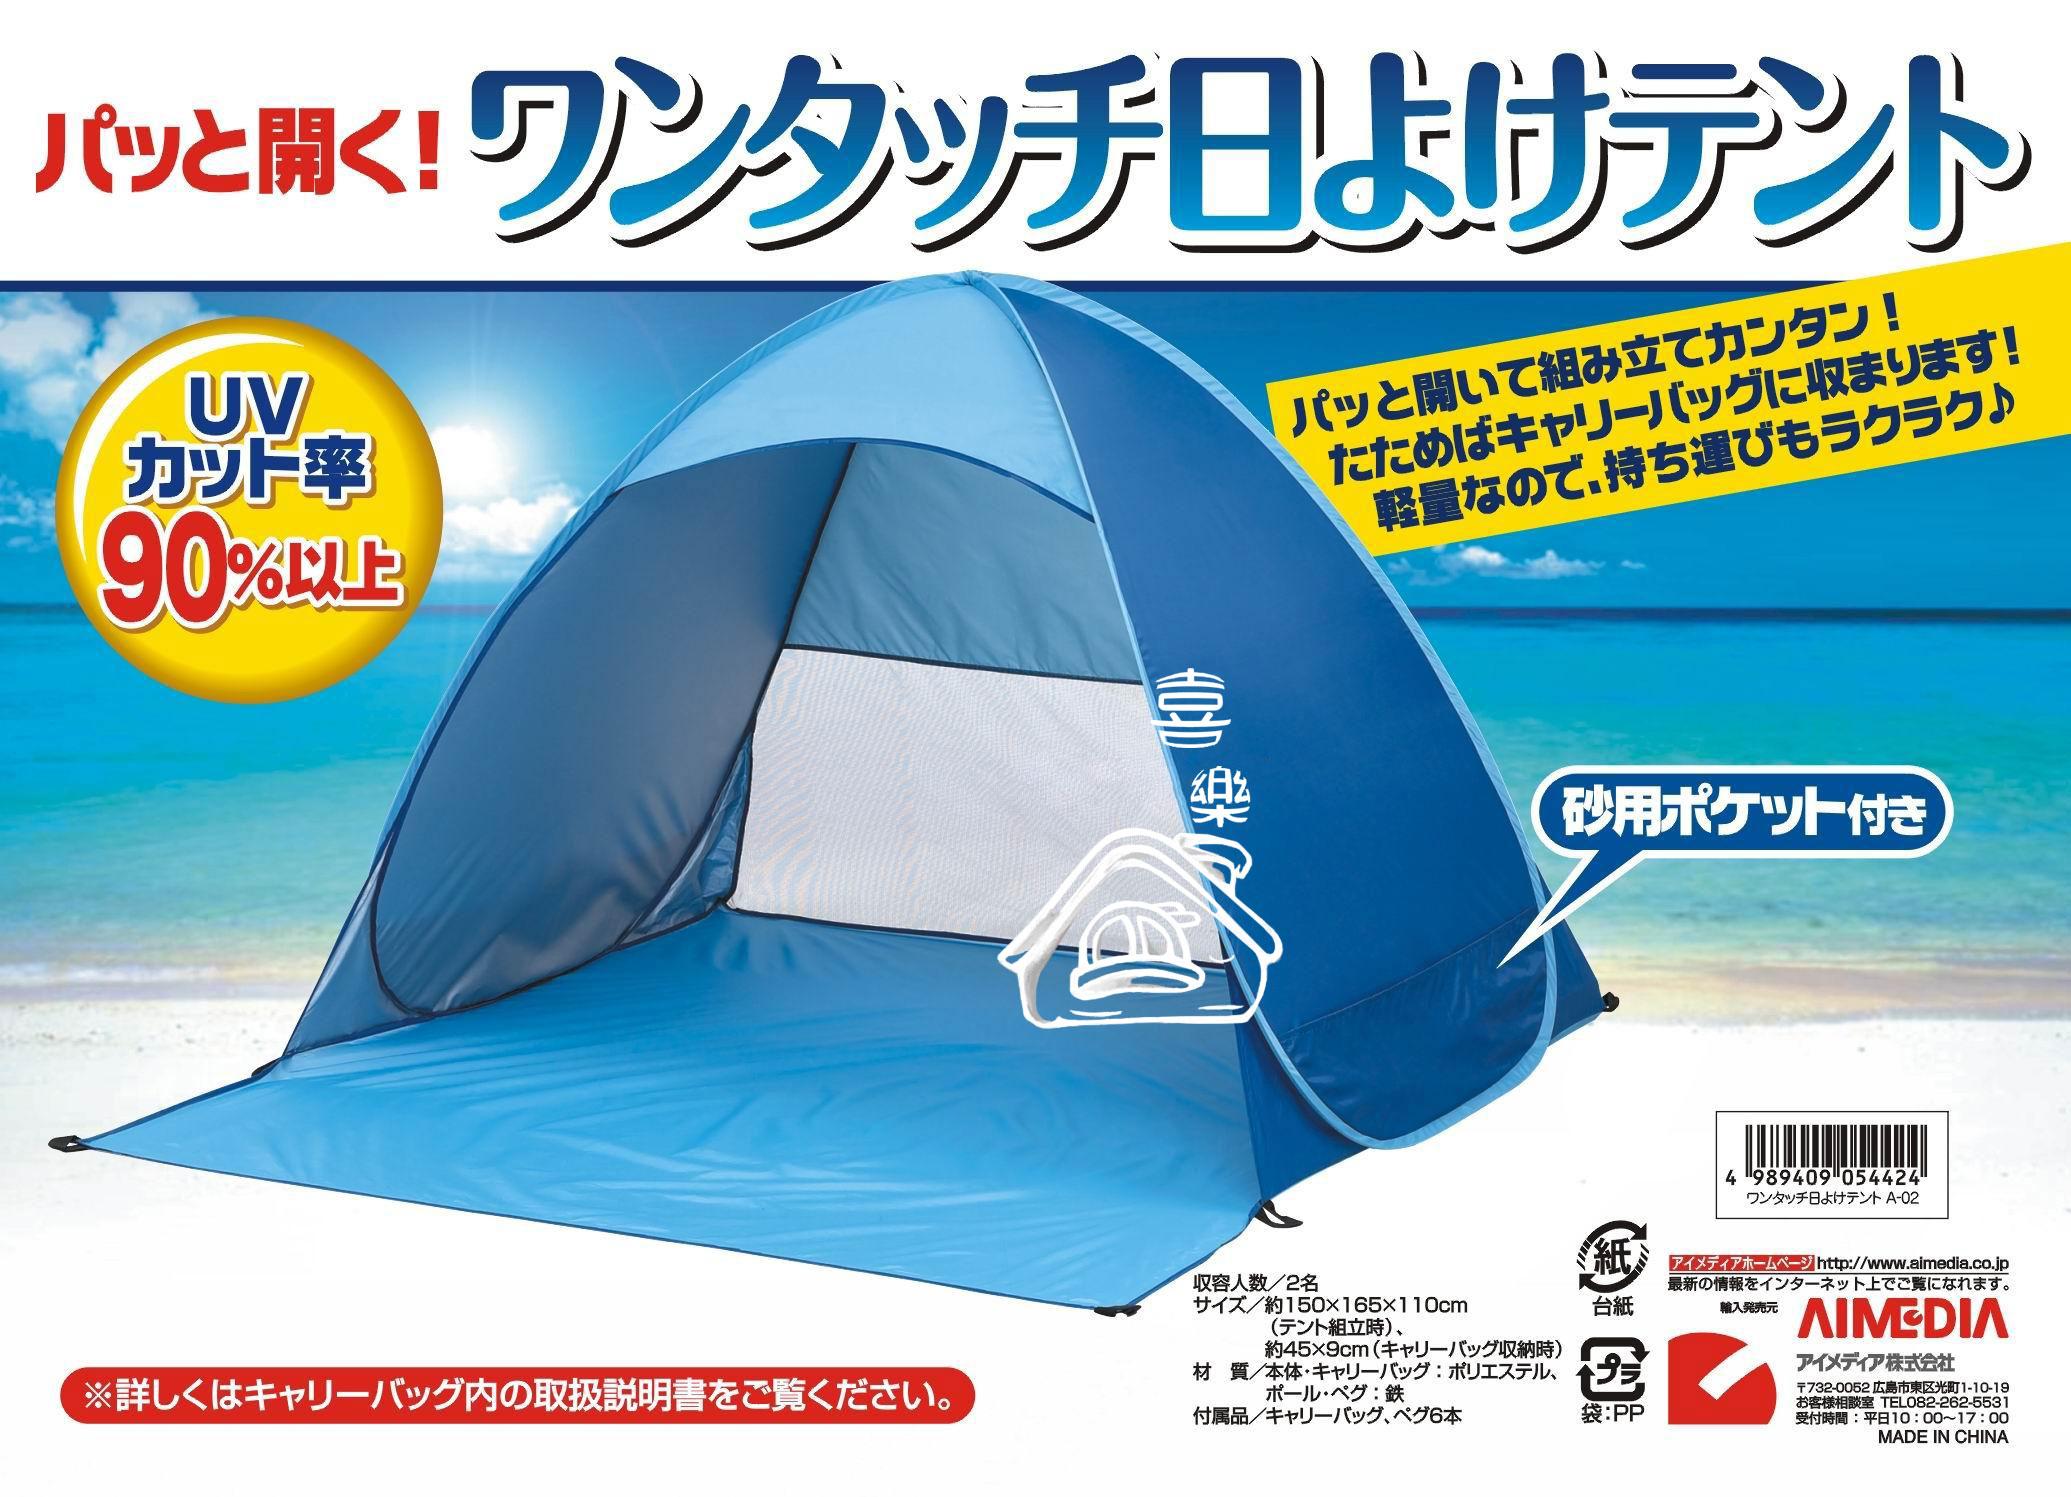 Палатка для рыбалки Aimedia Китай Aimedia